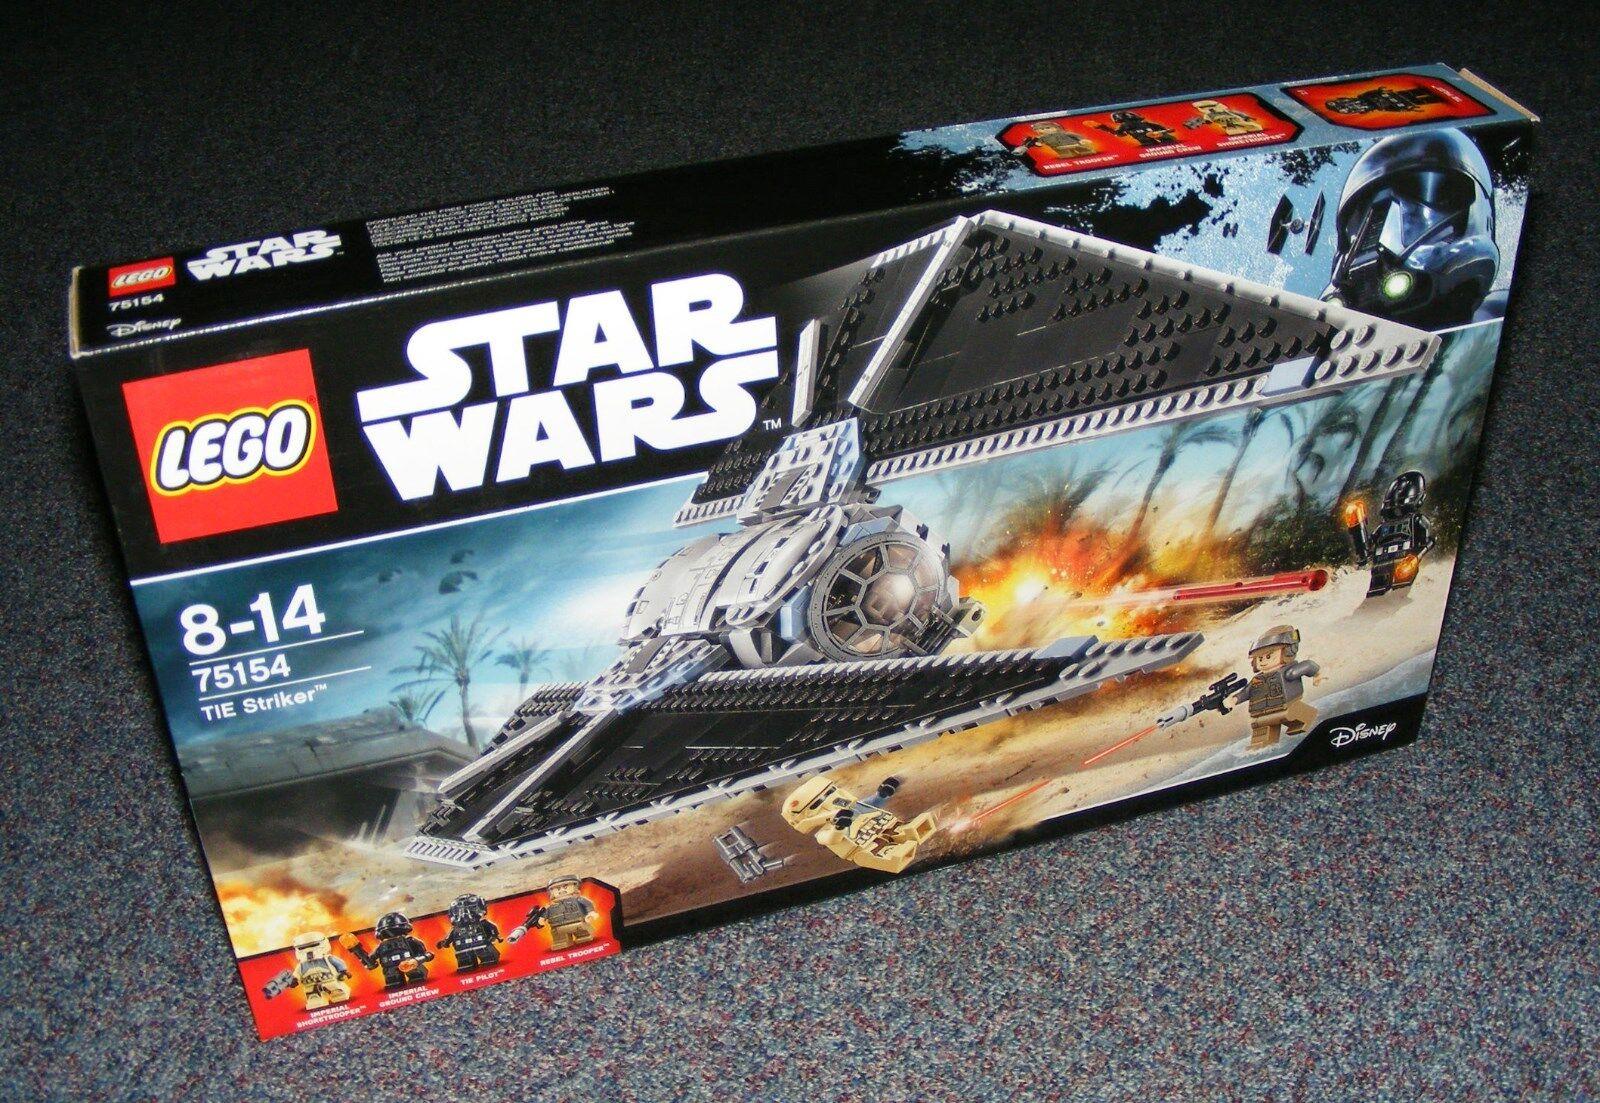 STAR WARS LEGO 75154 TIE STRIKER BRAND NEW SEALED BNIB